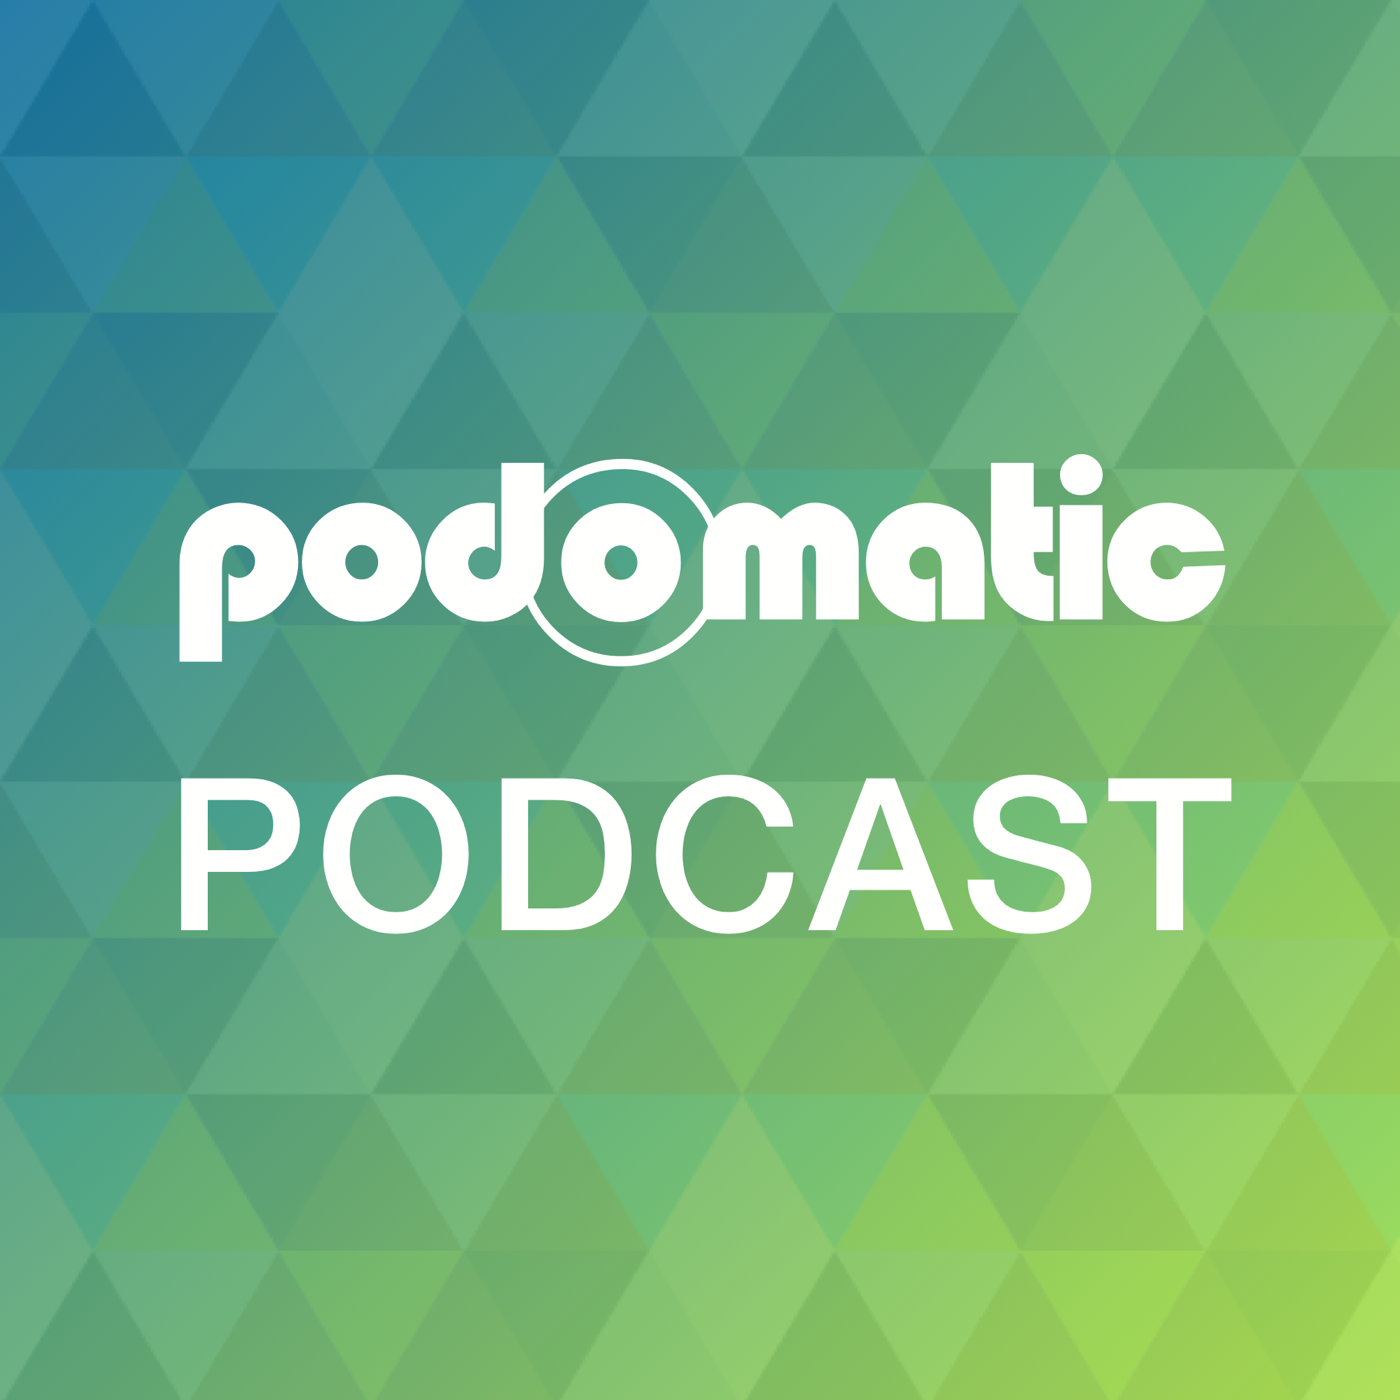 Nick Bradley's Podcast